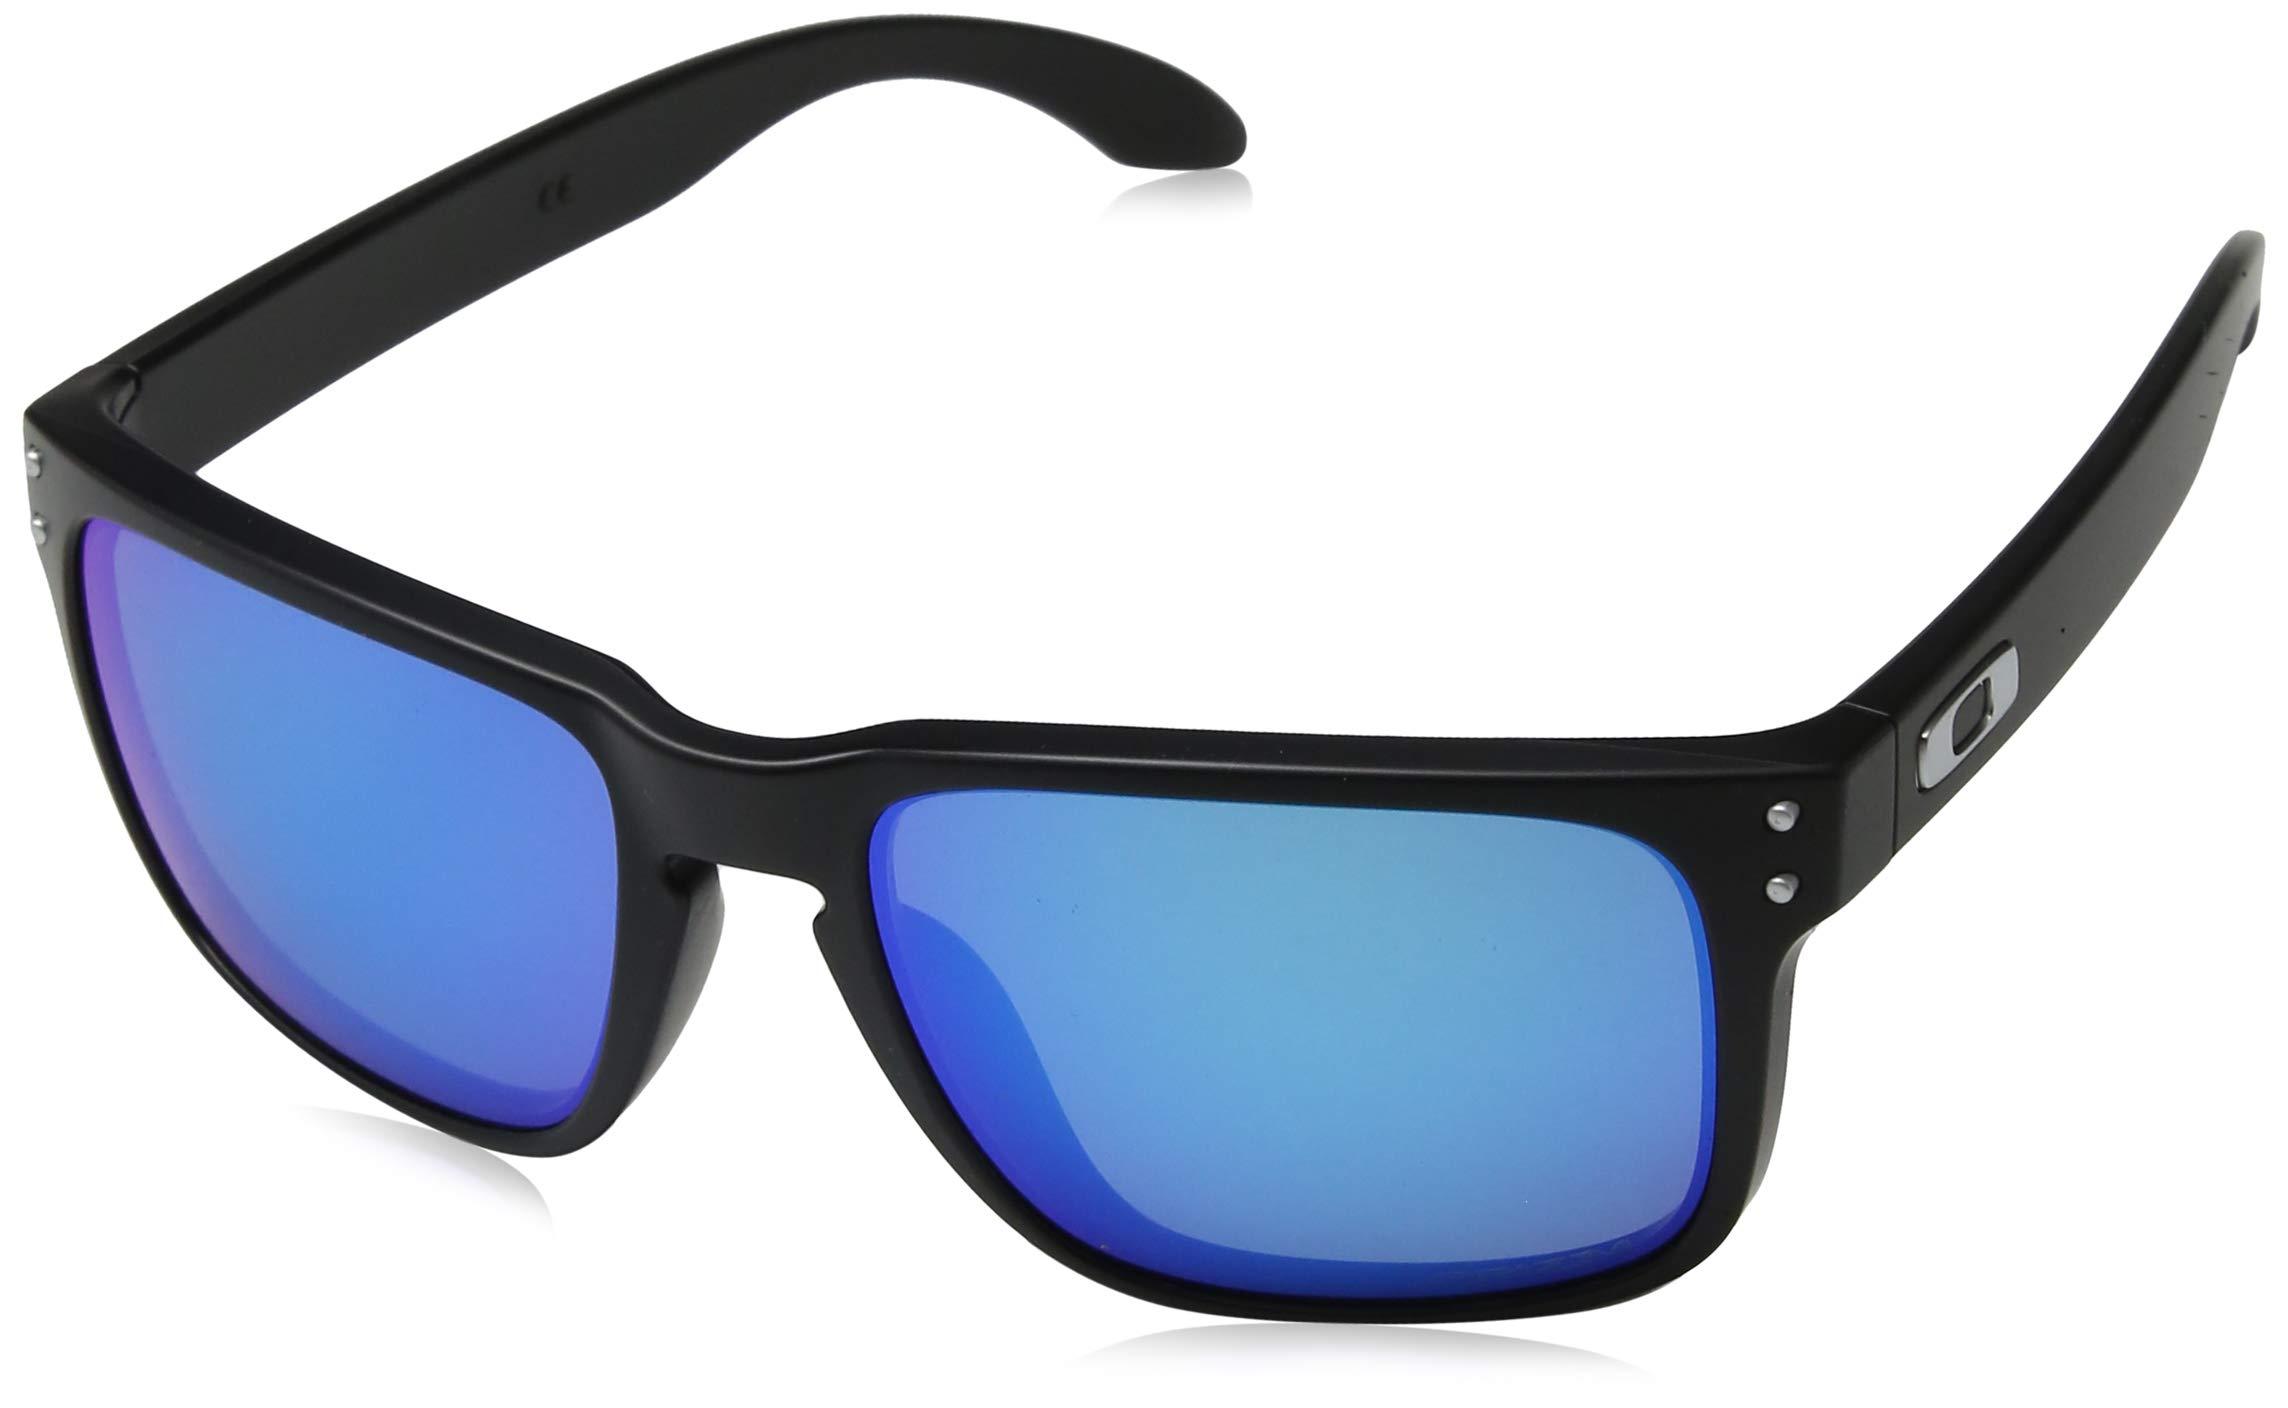 Oakley Men's OO9102 Holbrook Square Sunglasses, Matte Black/Prizm Sapphire Polarized, 57 mm